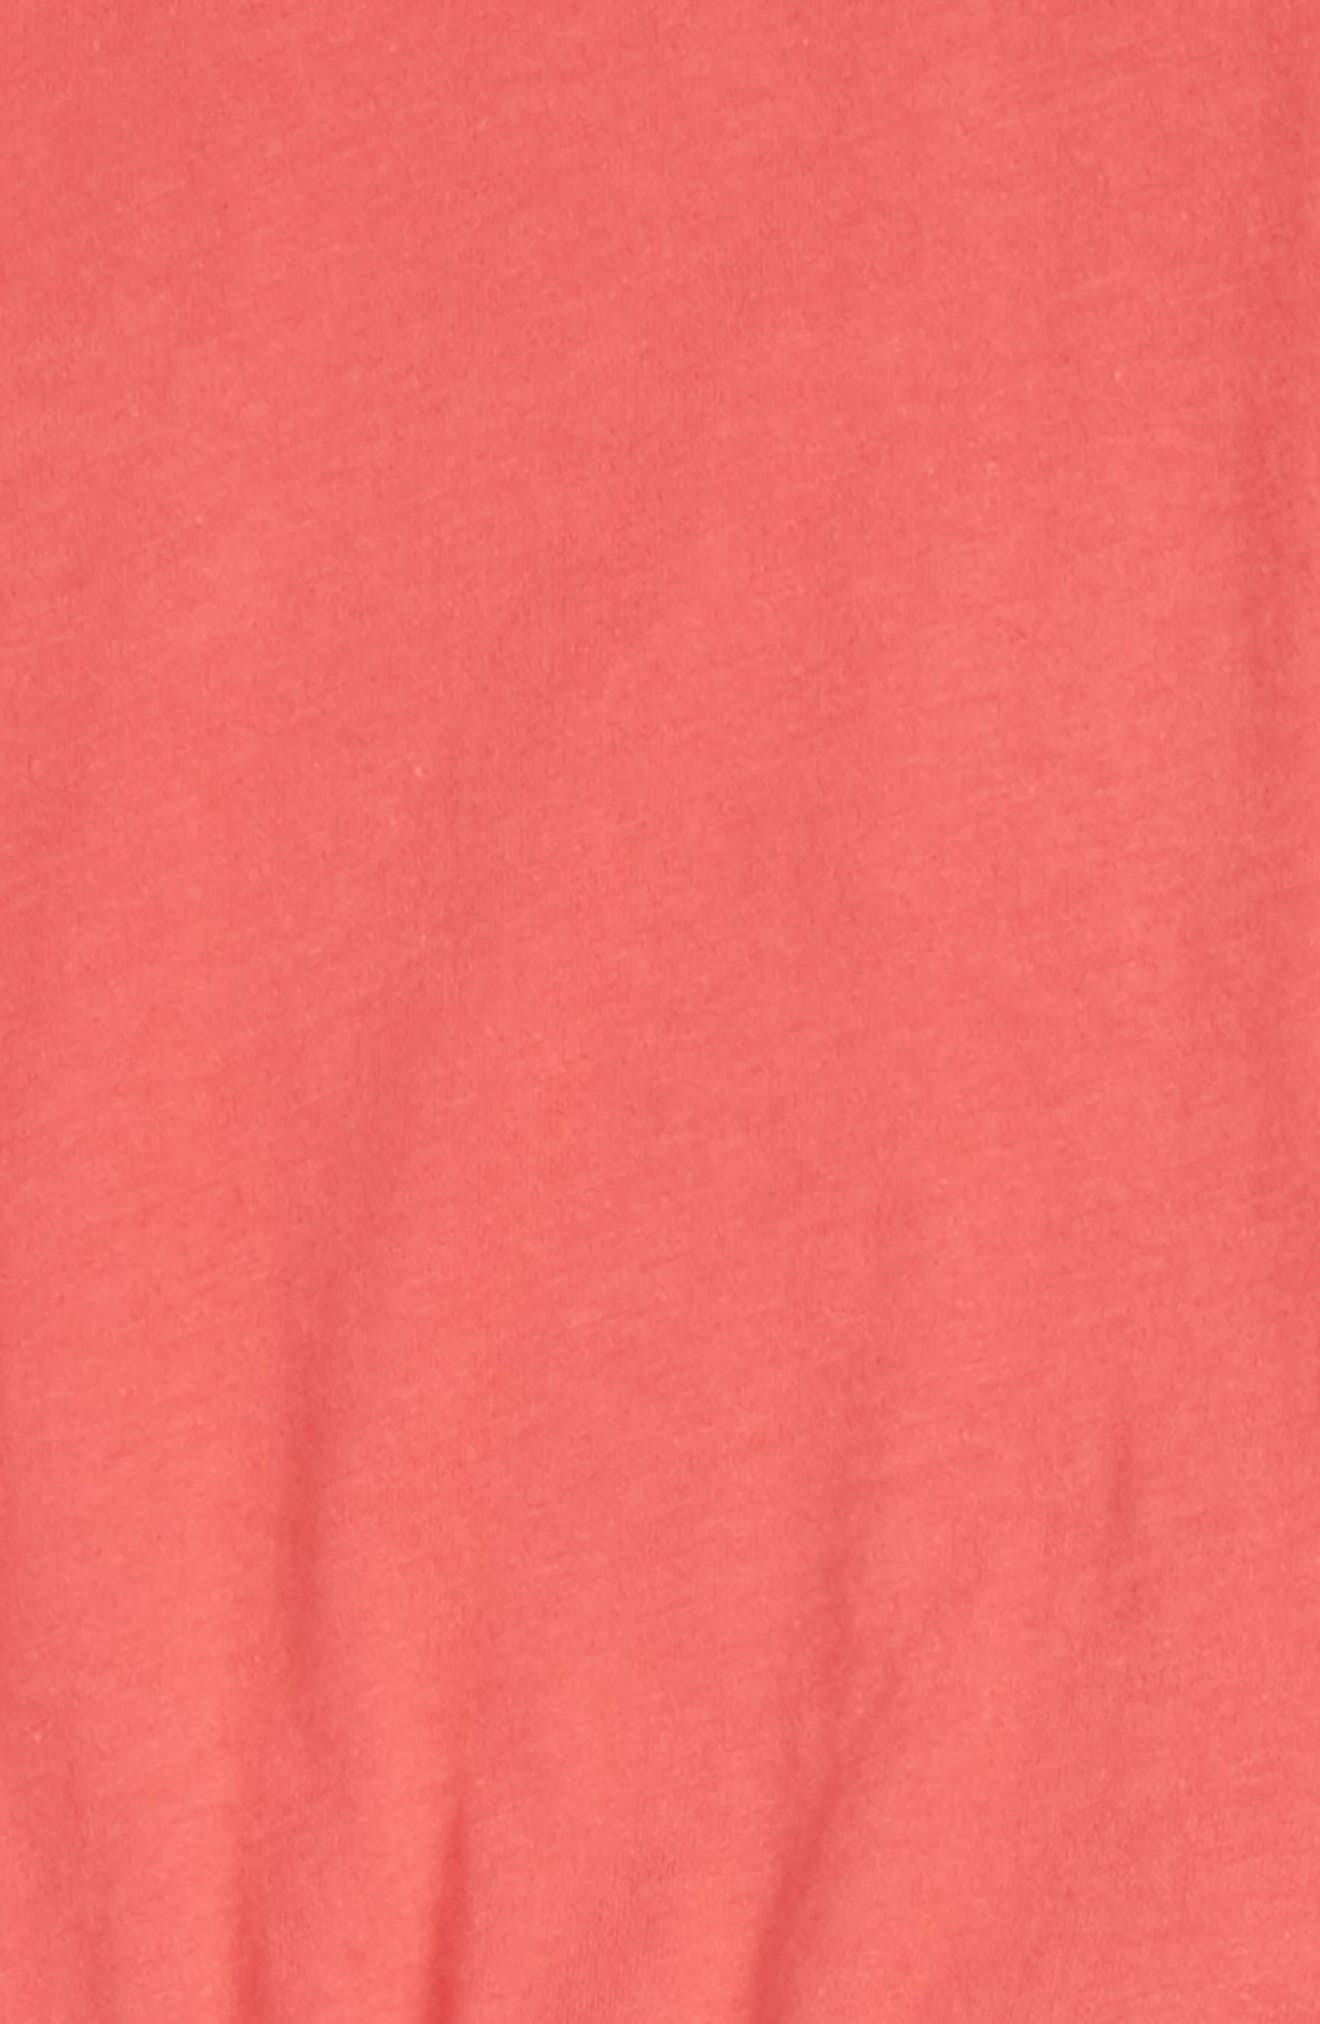 Cold Shoulder Top & Leggings Set,                             Alternate thumbnail 2, color,                             Coral Fan